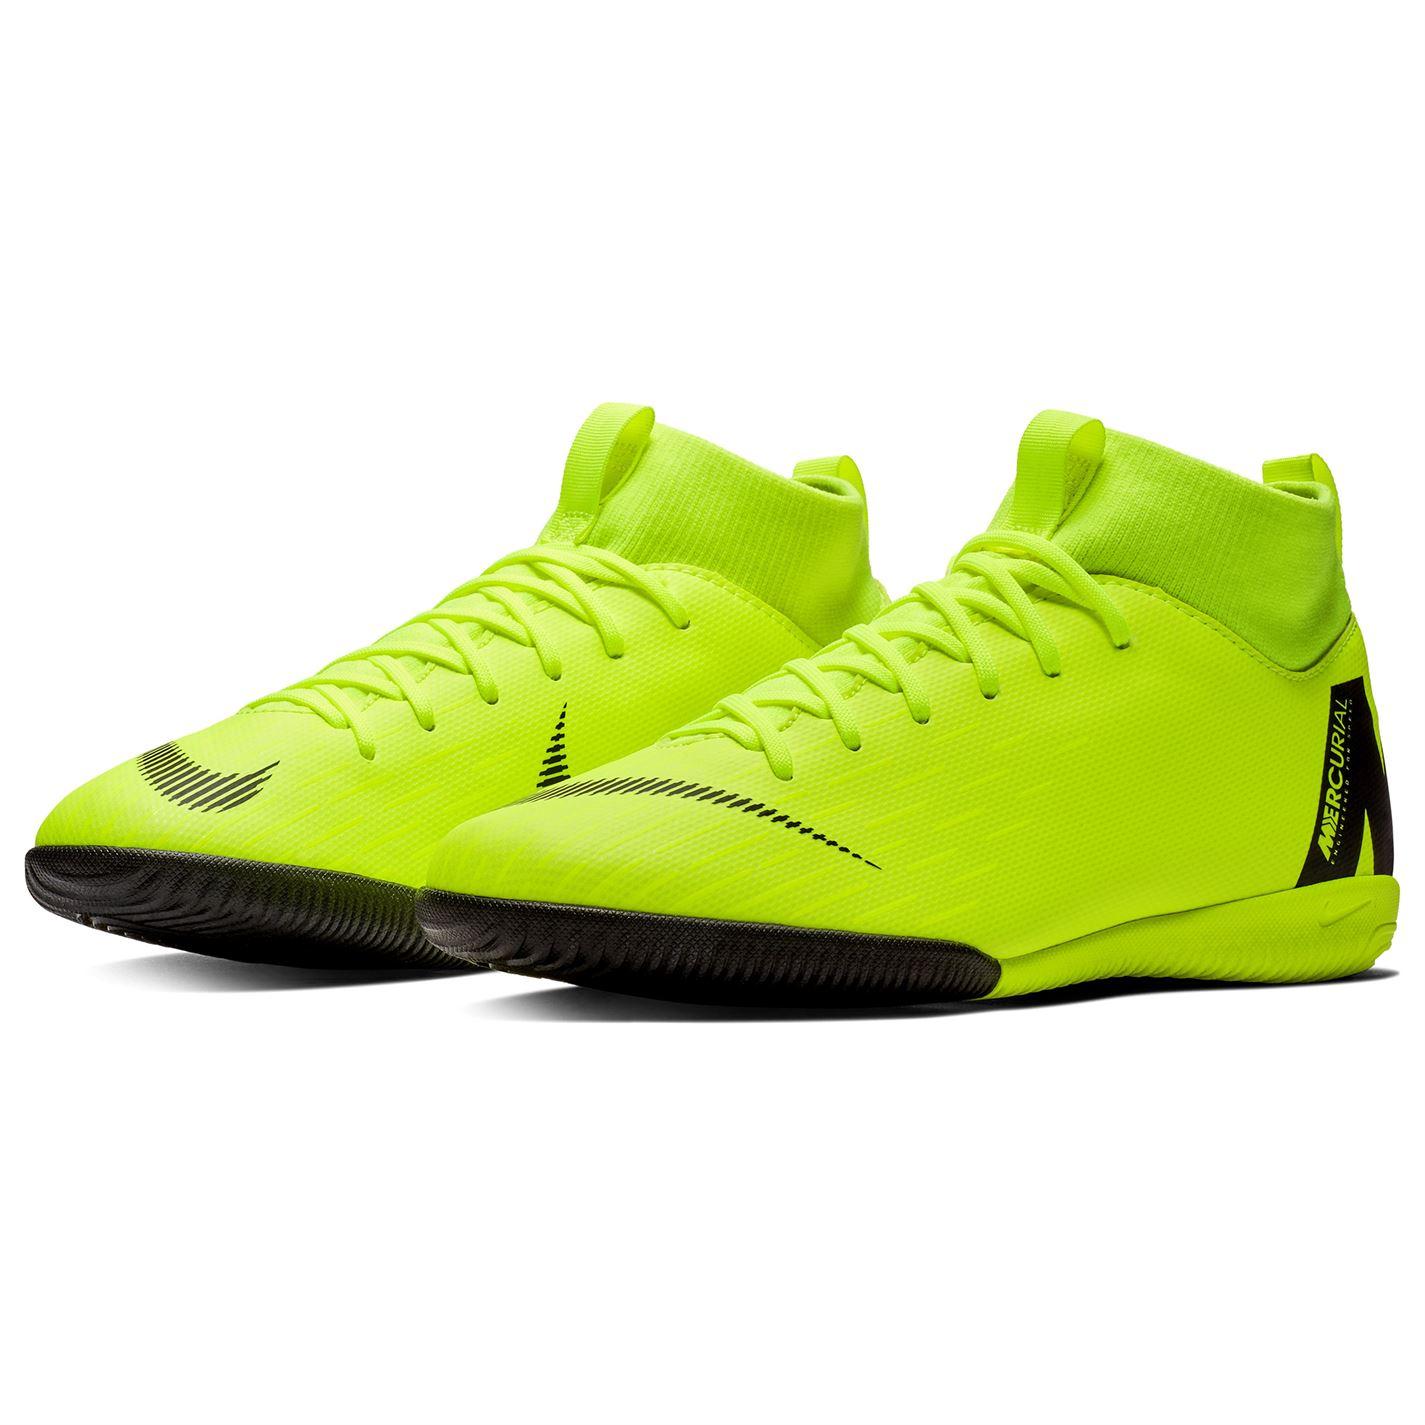 kopačky Nike Mercurial Veloce FG detské